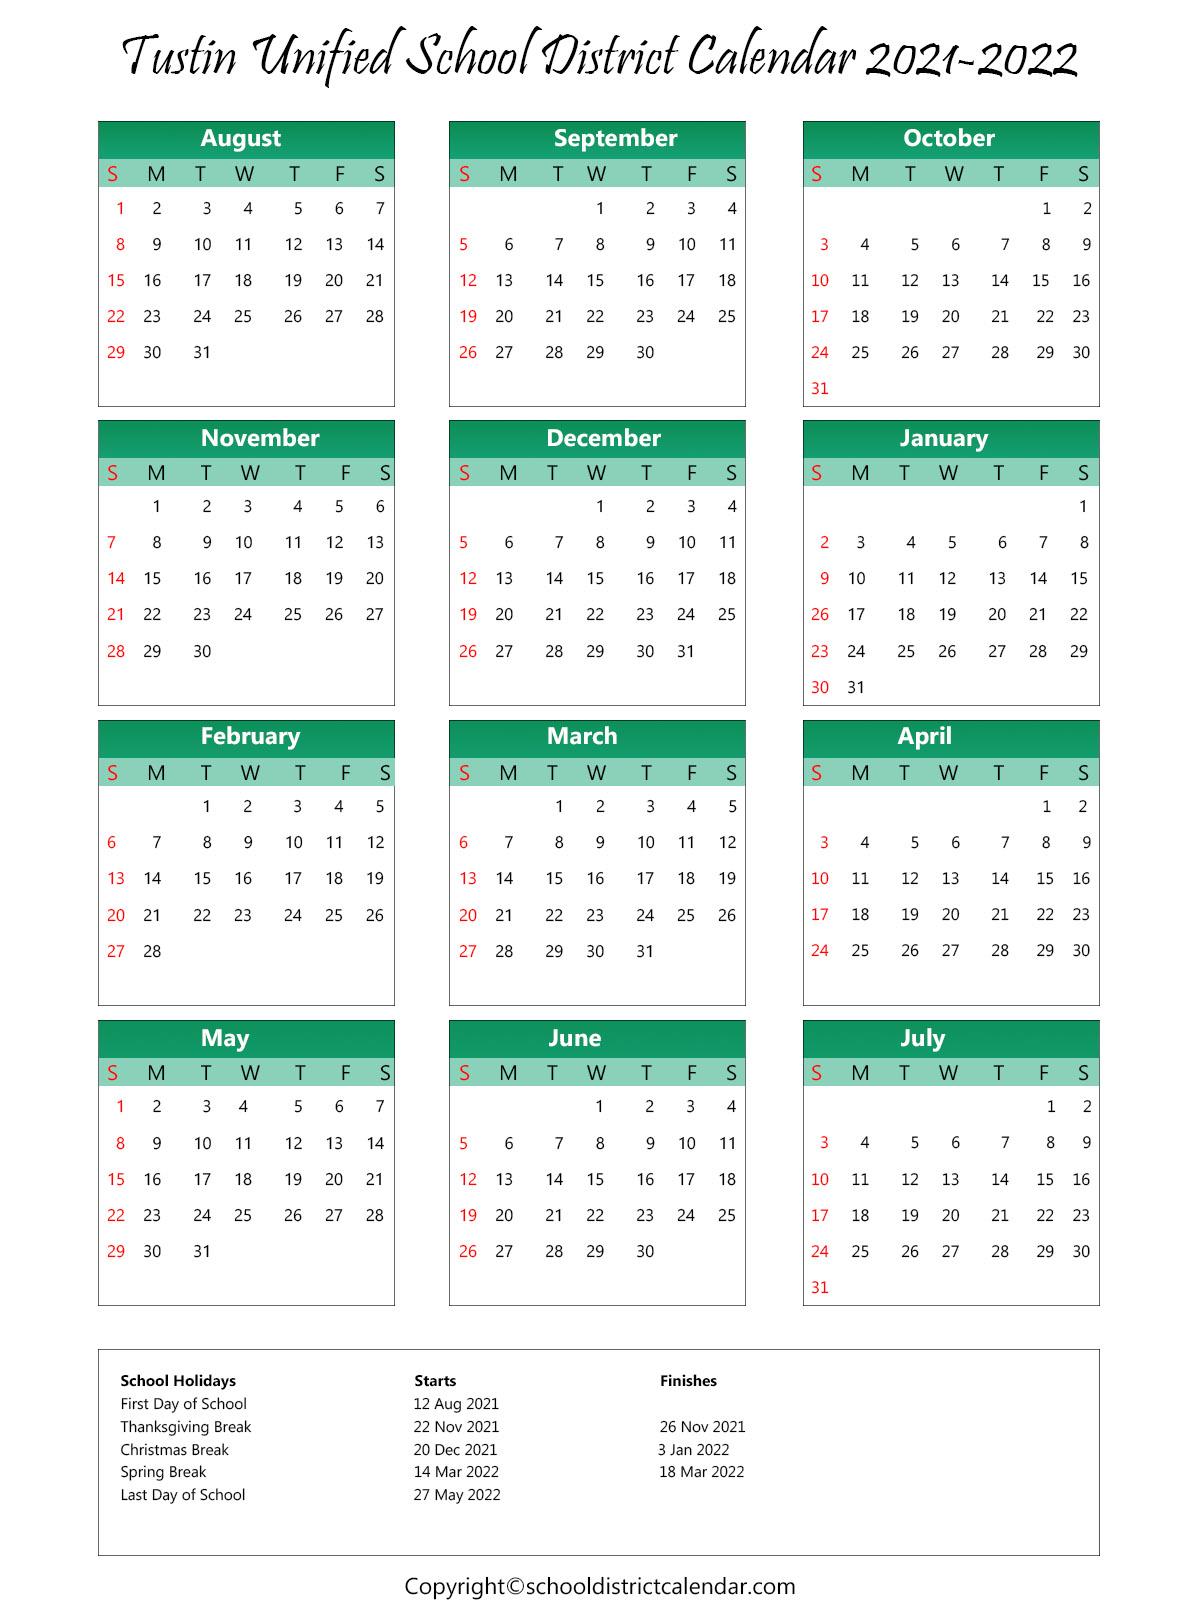 Tustin Unified School District, California Calendar Holidays 2021